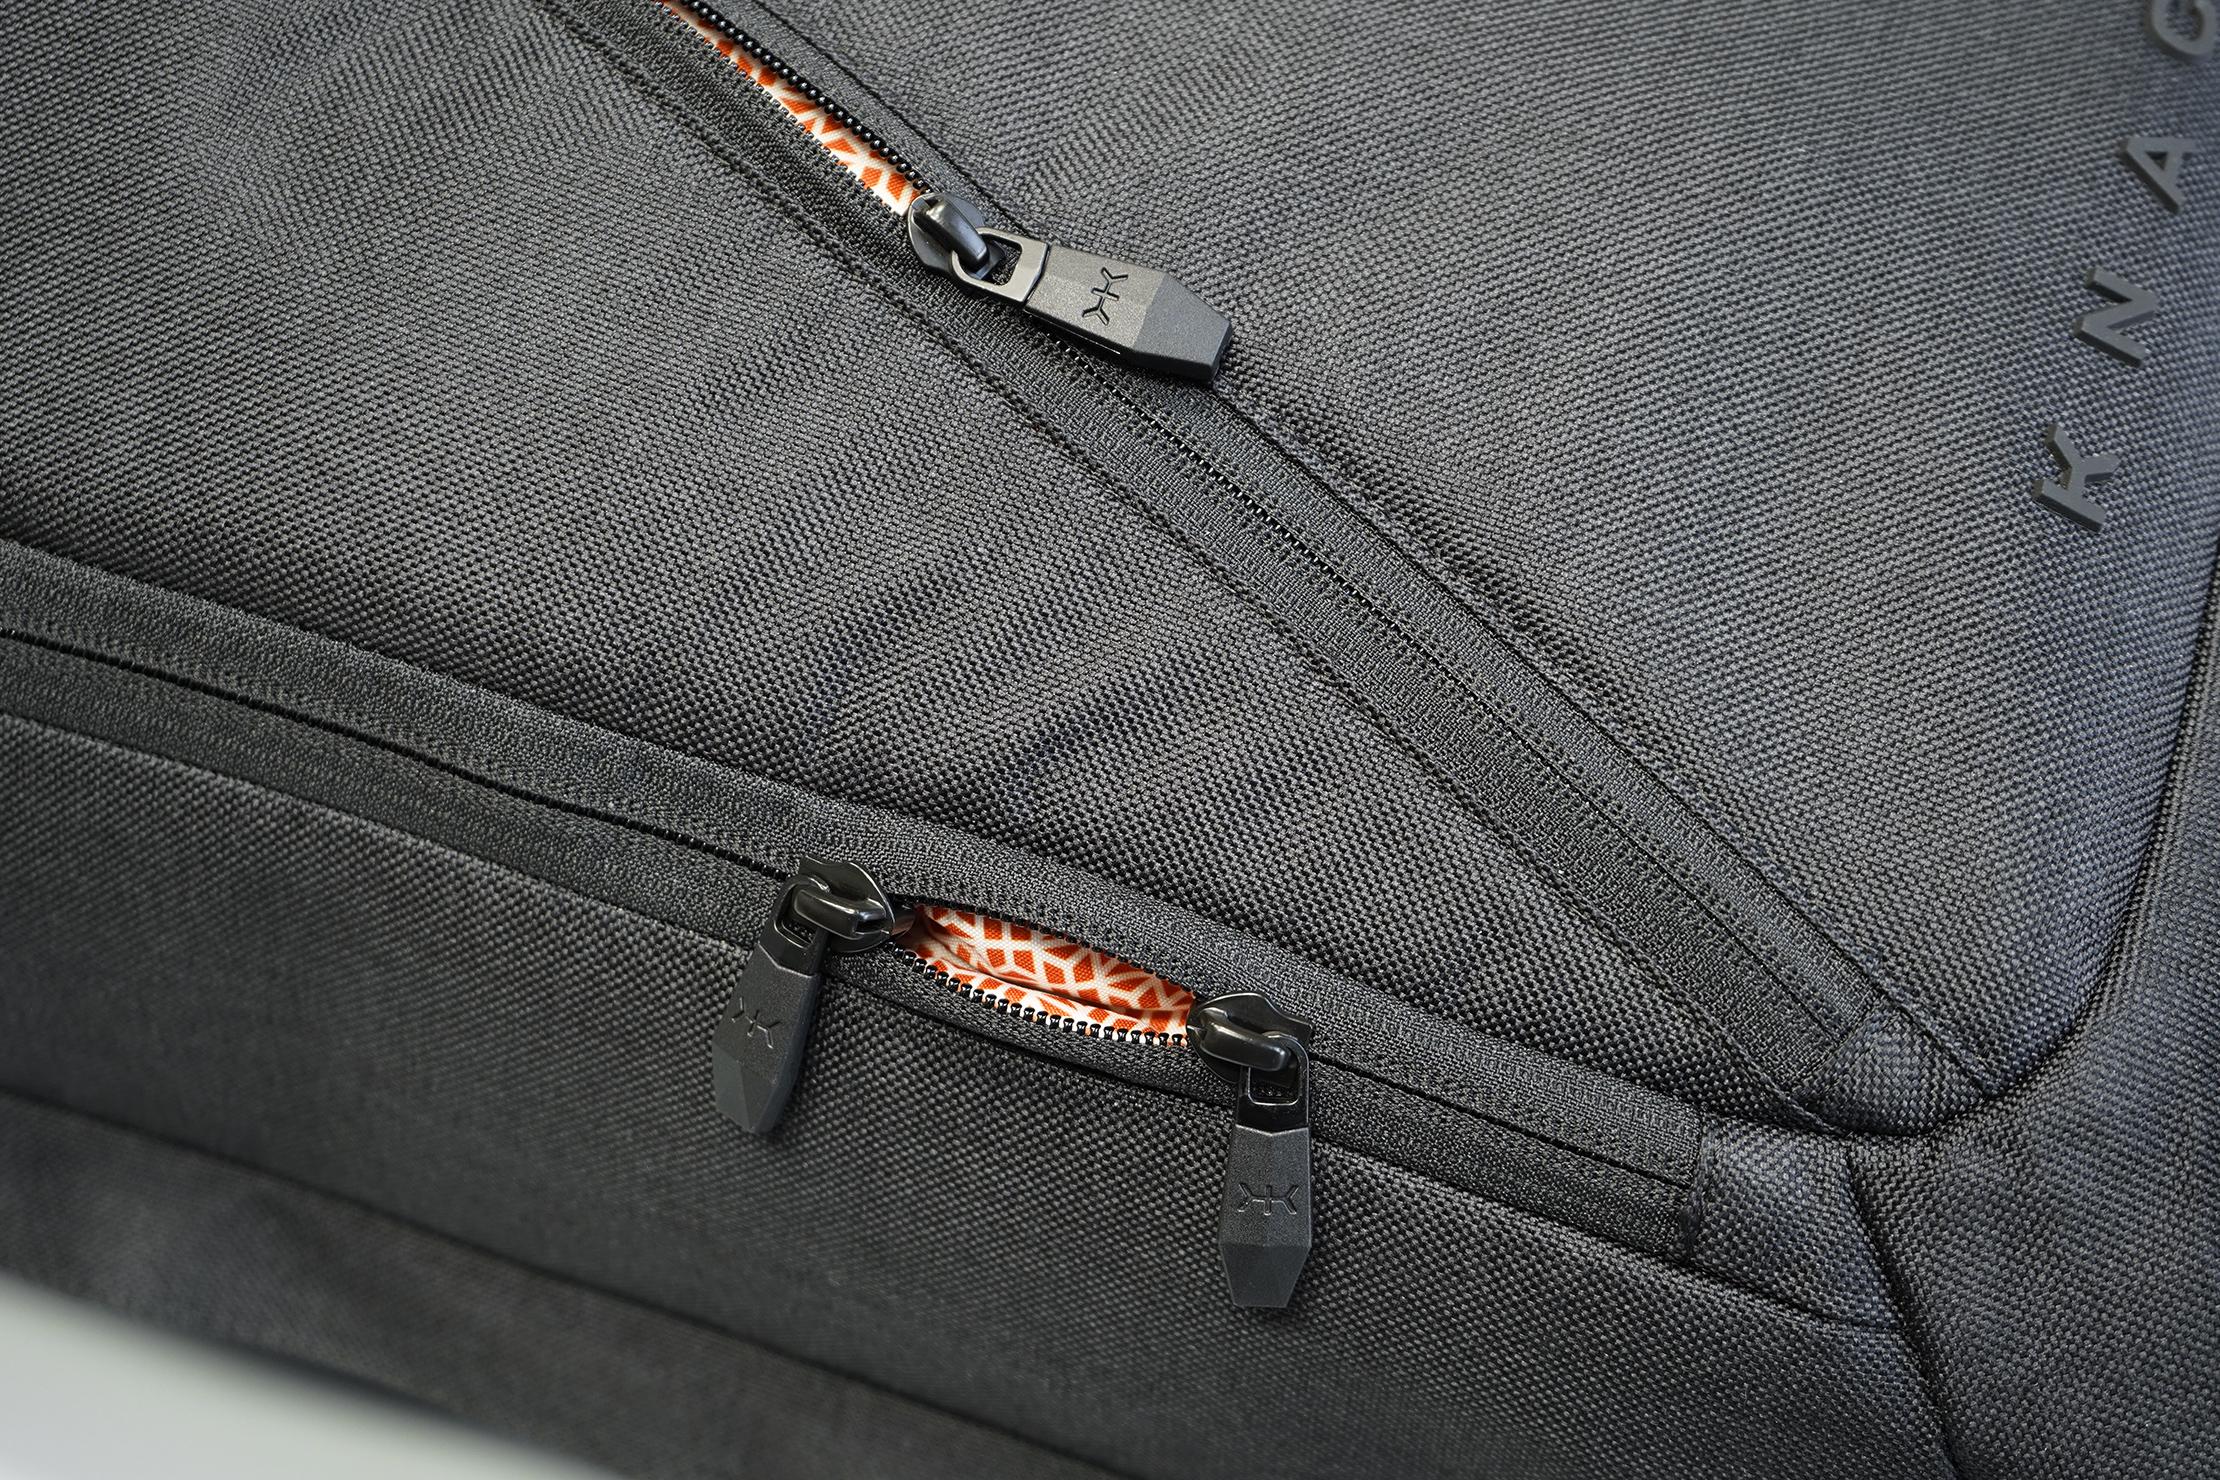 Knack Large Expandable Pack YKK Zippers